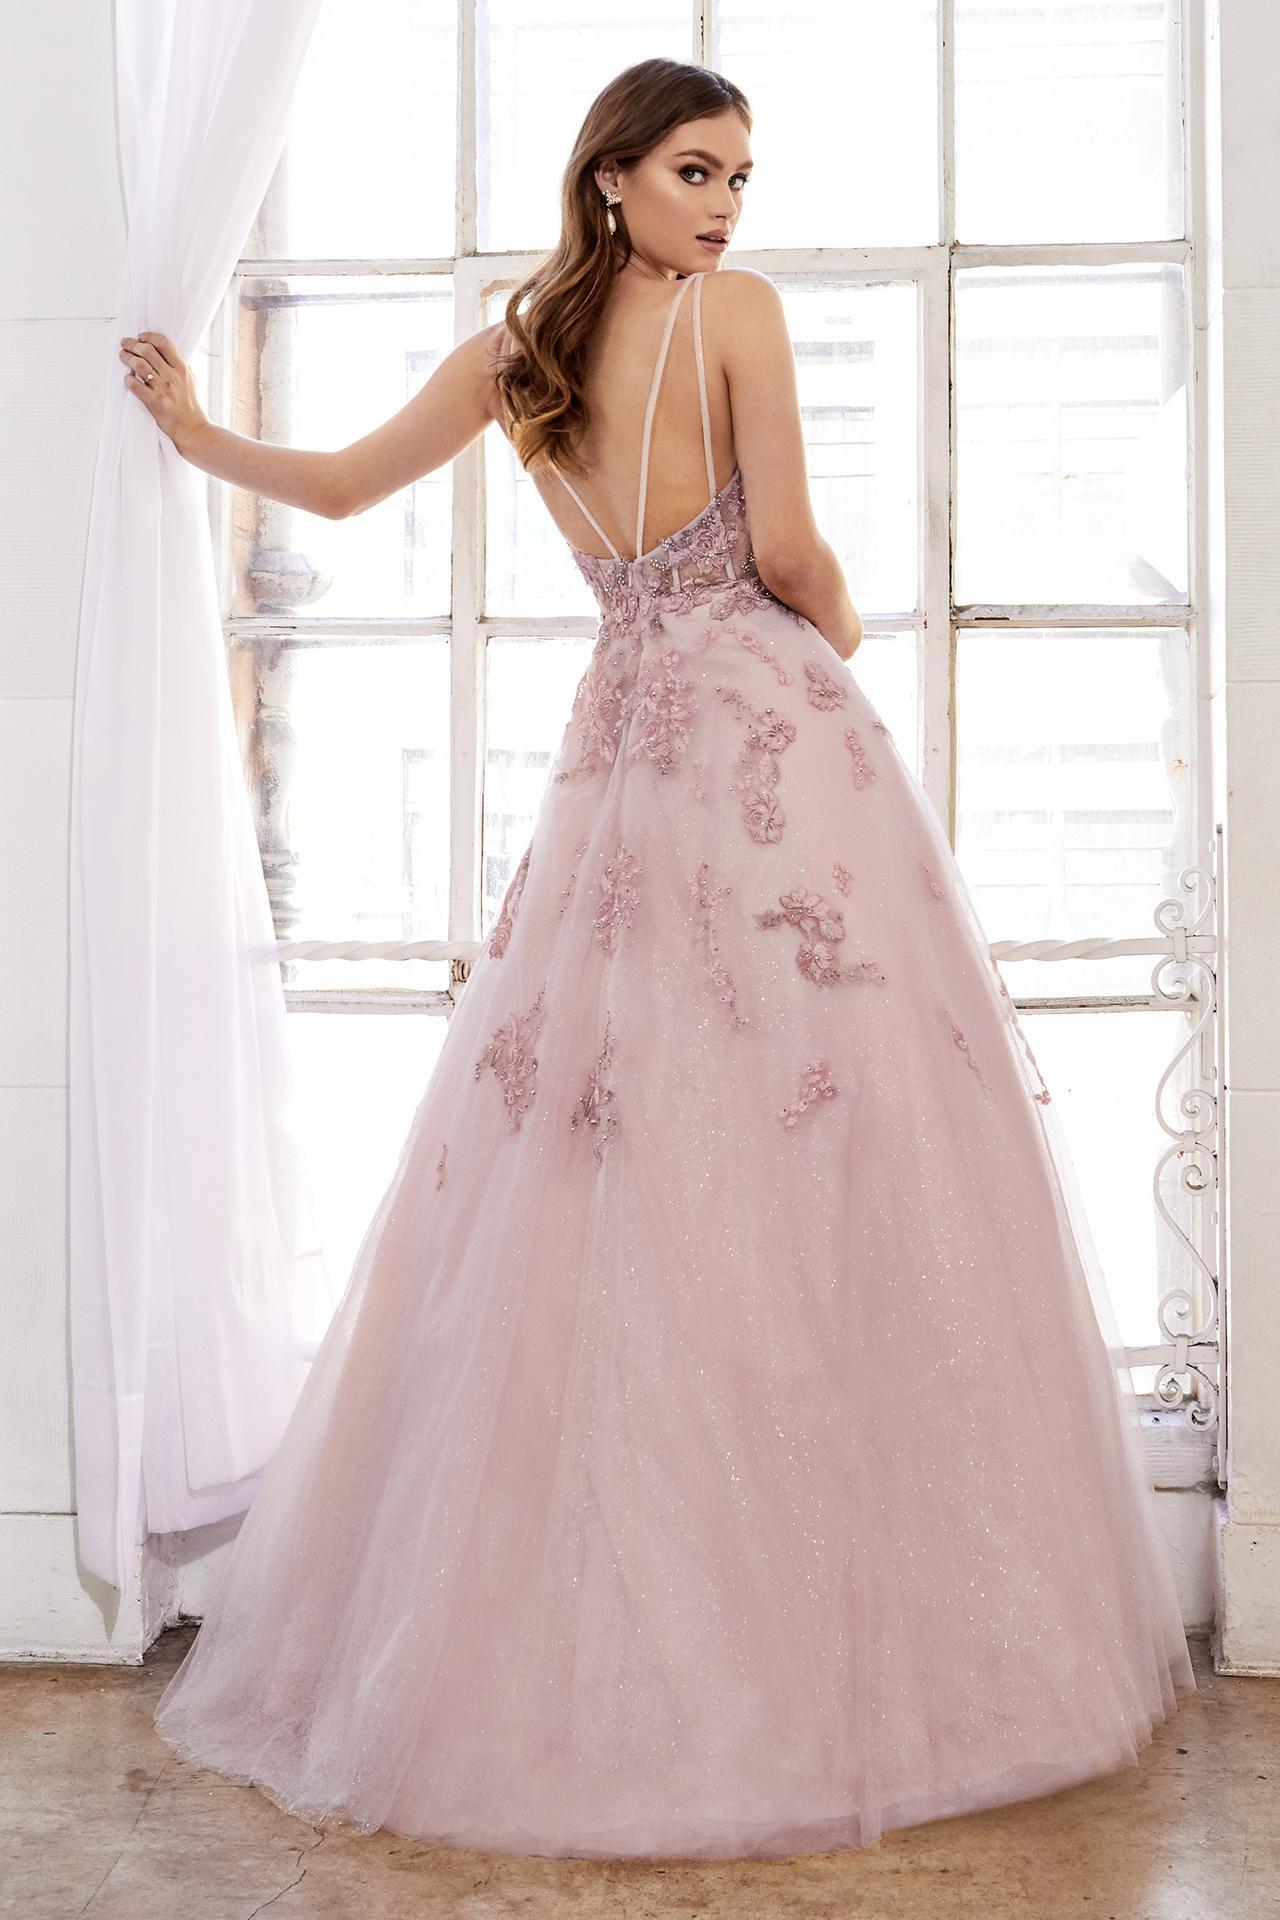 Nové spoločenské šaty :) - Obrázok č. 56